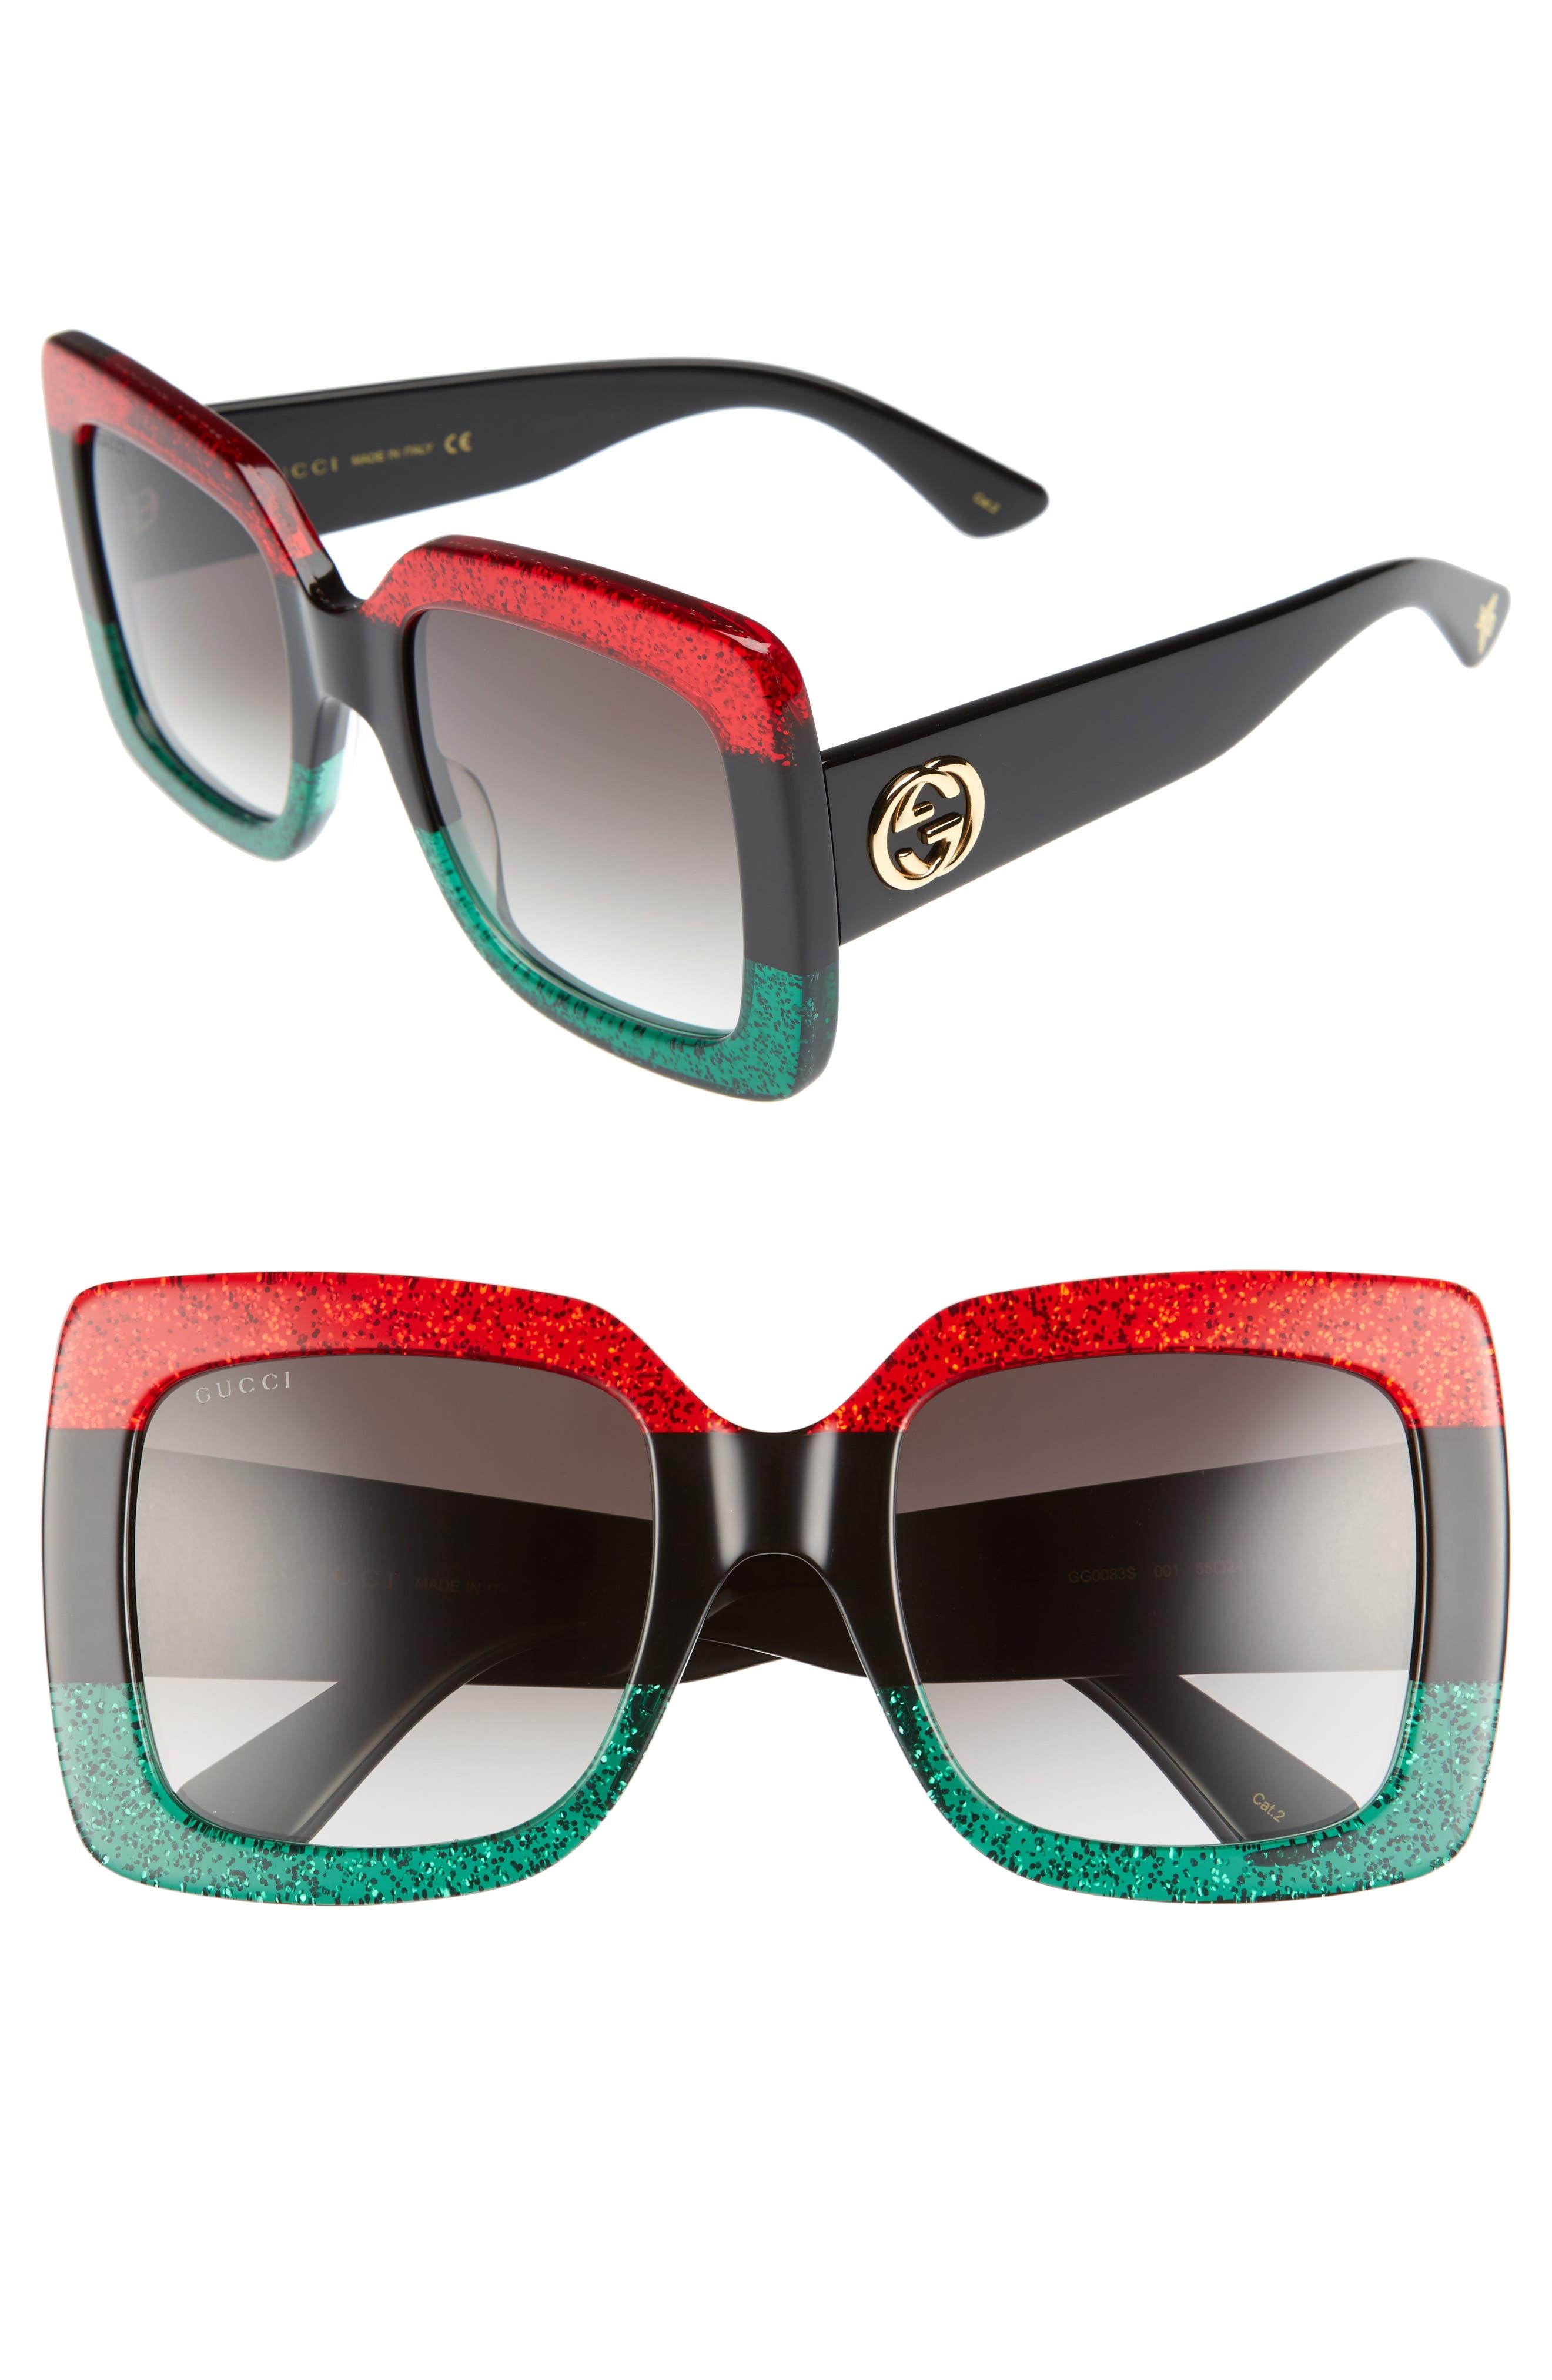 55mm Square Sunglasses,                             Main thumbnail 1, color,                             RED BLACK GREEN/ GREY